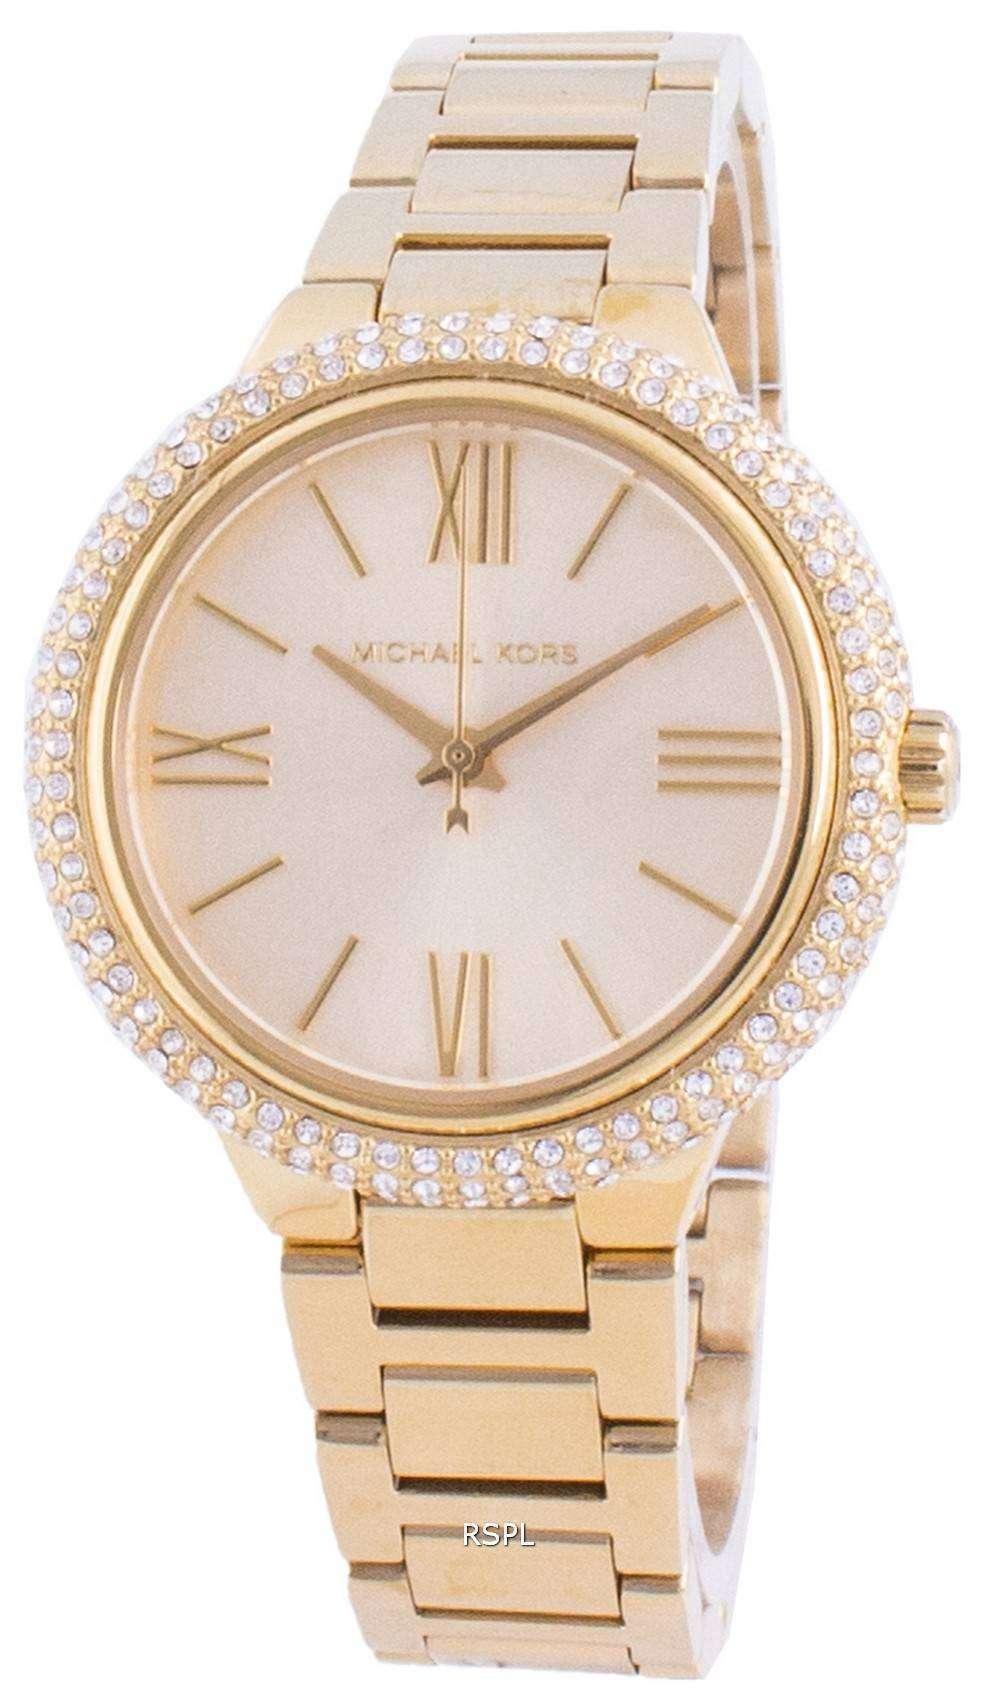 Michael Kors Taryn MK4459 Reloj de mujer con detalles de diamantes de cuarzo